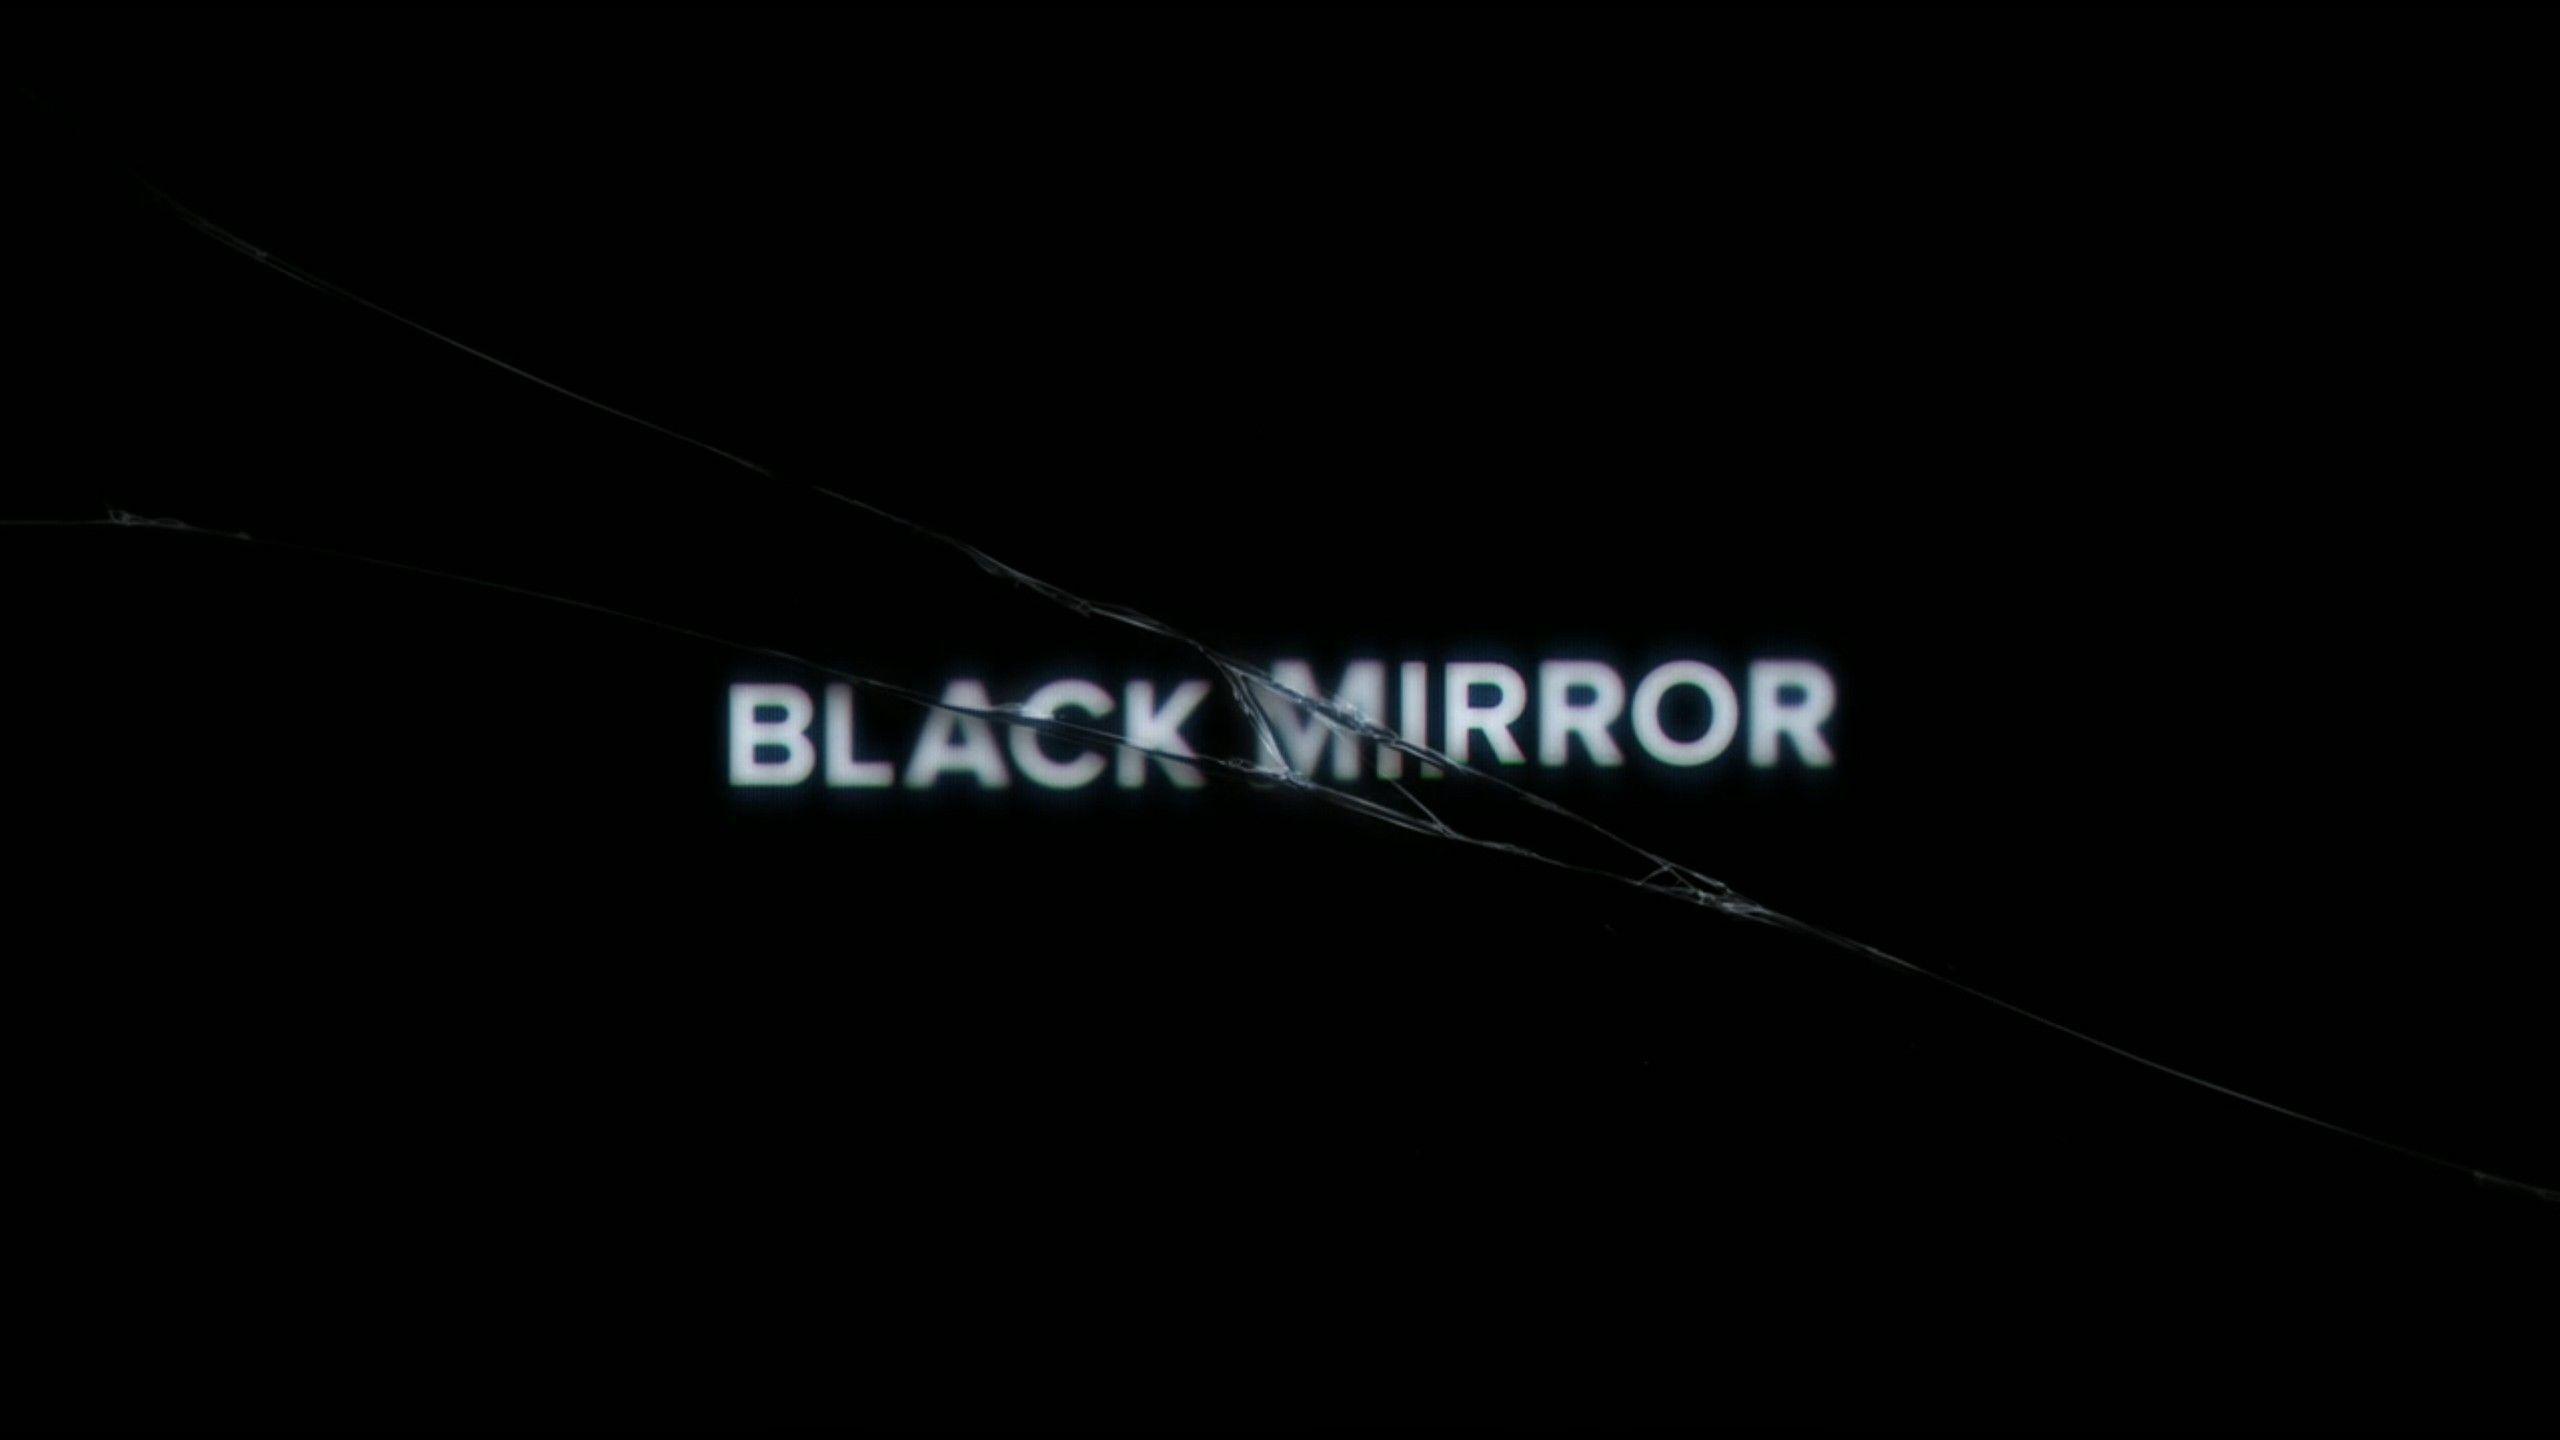 Black Mirror Wallpapers  Wallpaper Cave